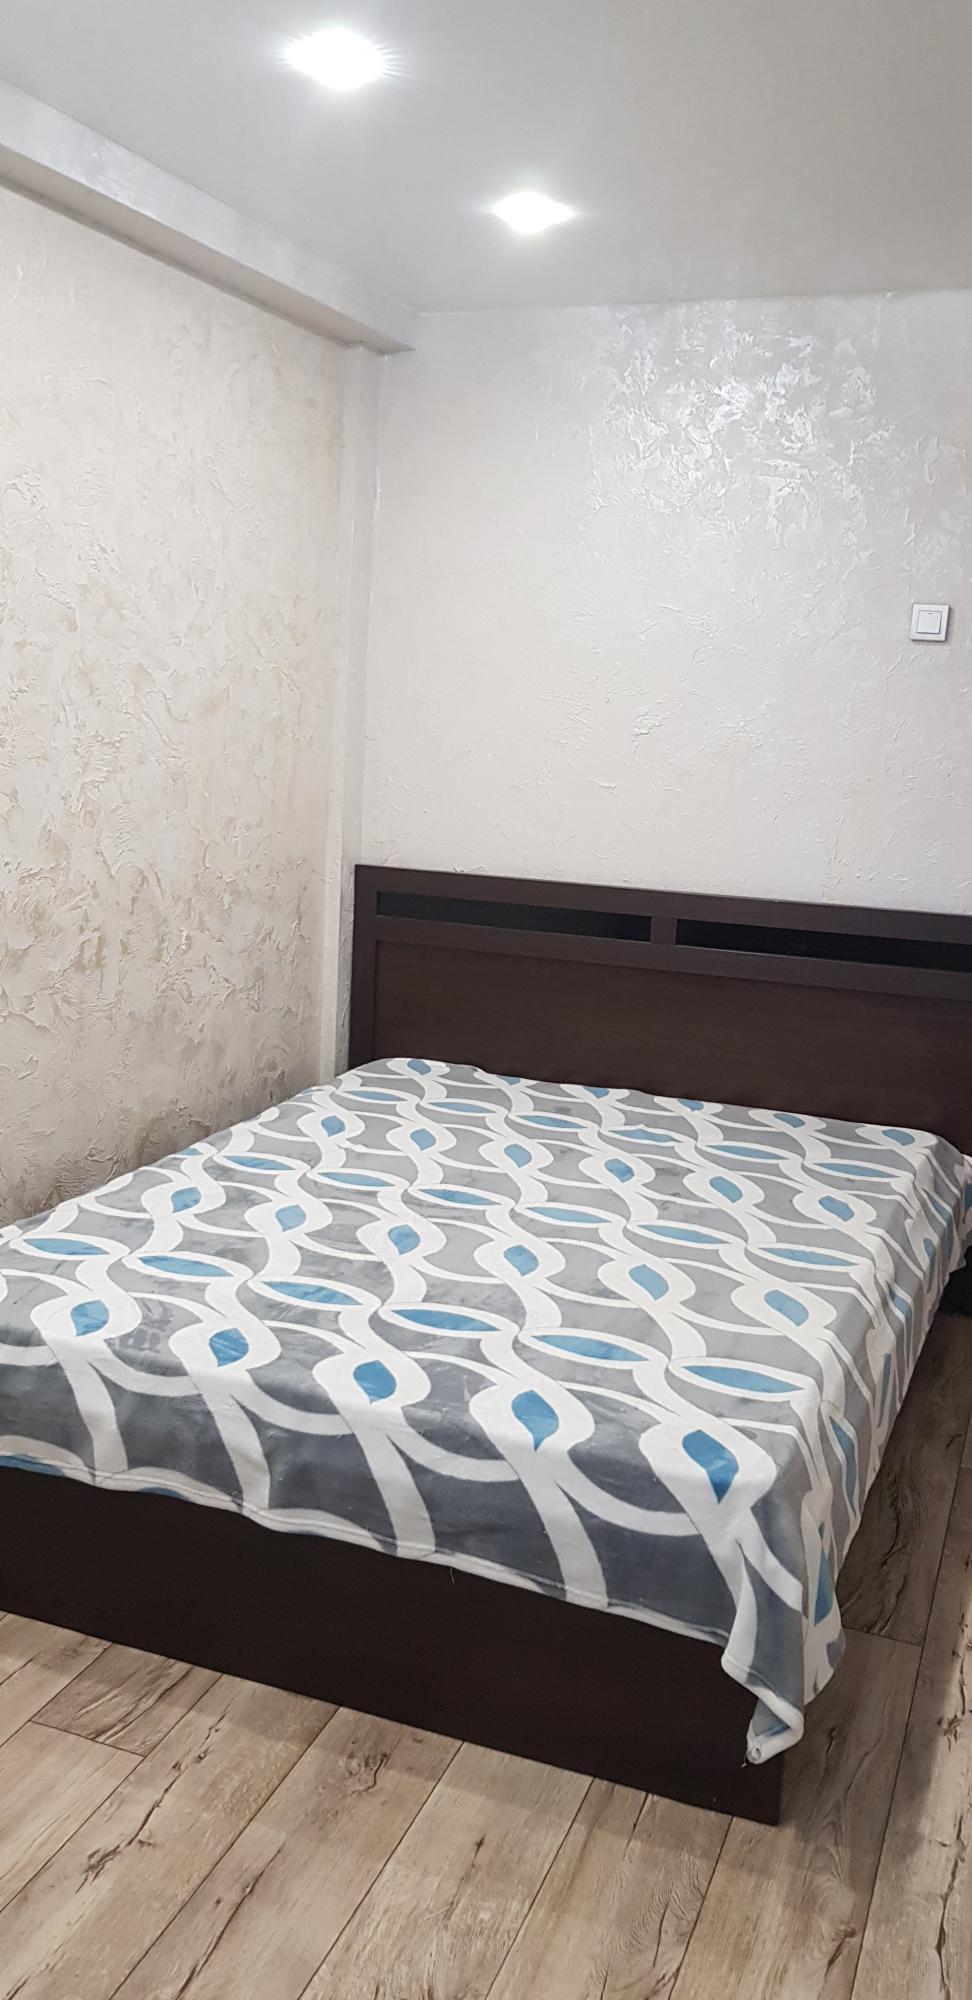 2к квартира улица Краснодарская, 3 | 18000 | аренда в Красноярске фото 4